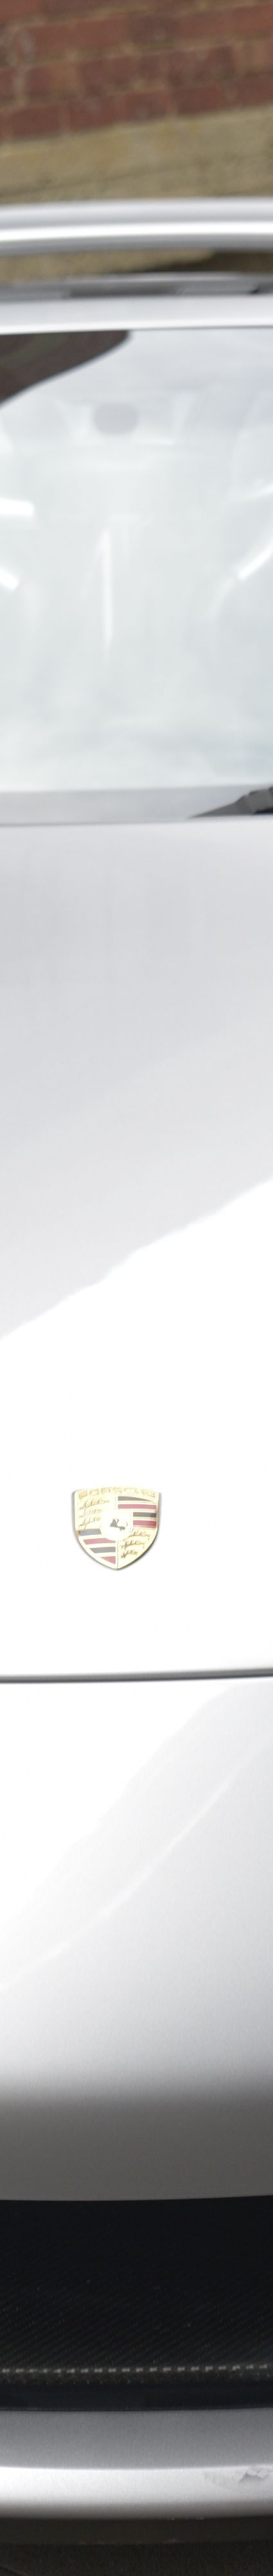 2005 Porsche Carrera GT for sale at Dutton Garage Richmond Melbourne Victoria Australia United Kingdom New Zealand classic modern prestige luxury exotic car collectible motorsport racing sports car dealership sell my car buy my car sales